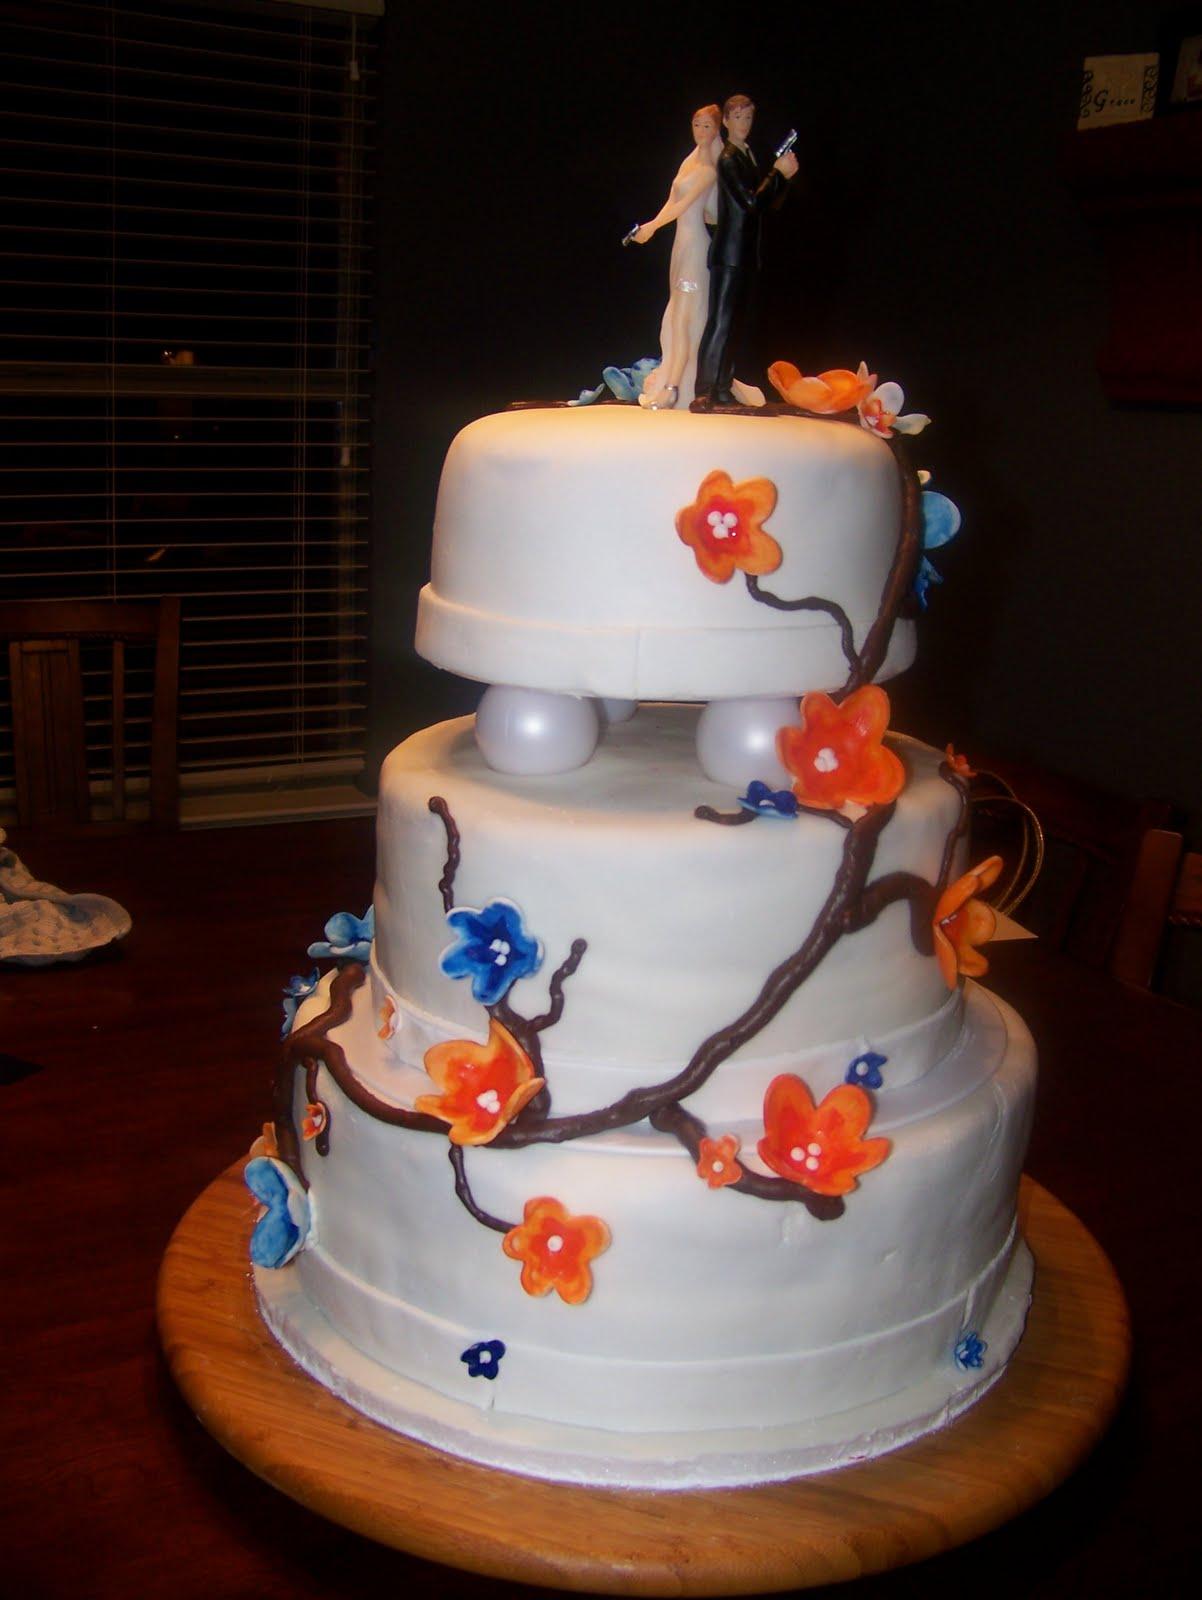 Rockin Cakes Orange and Blue Blossom s Wedding Cake